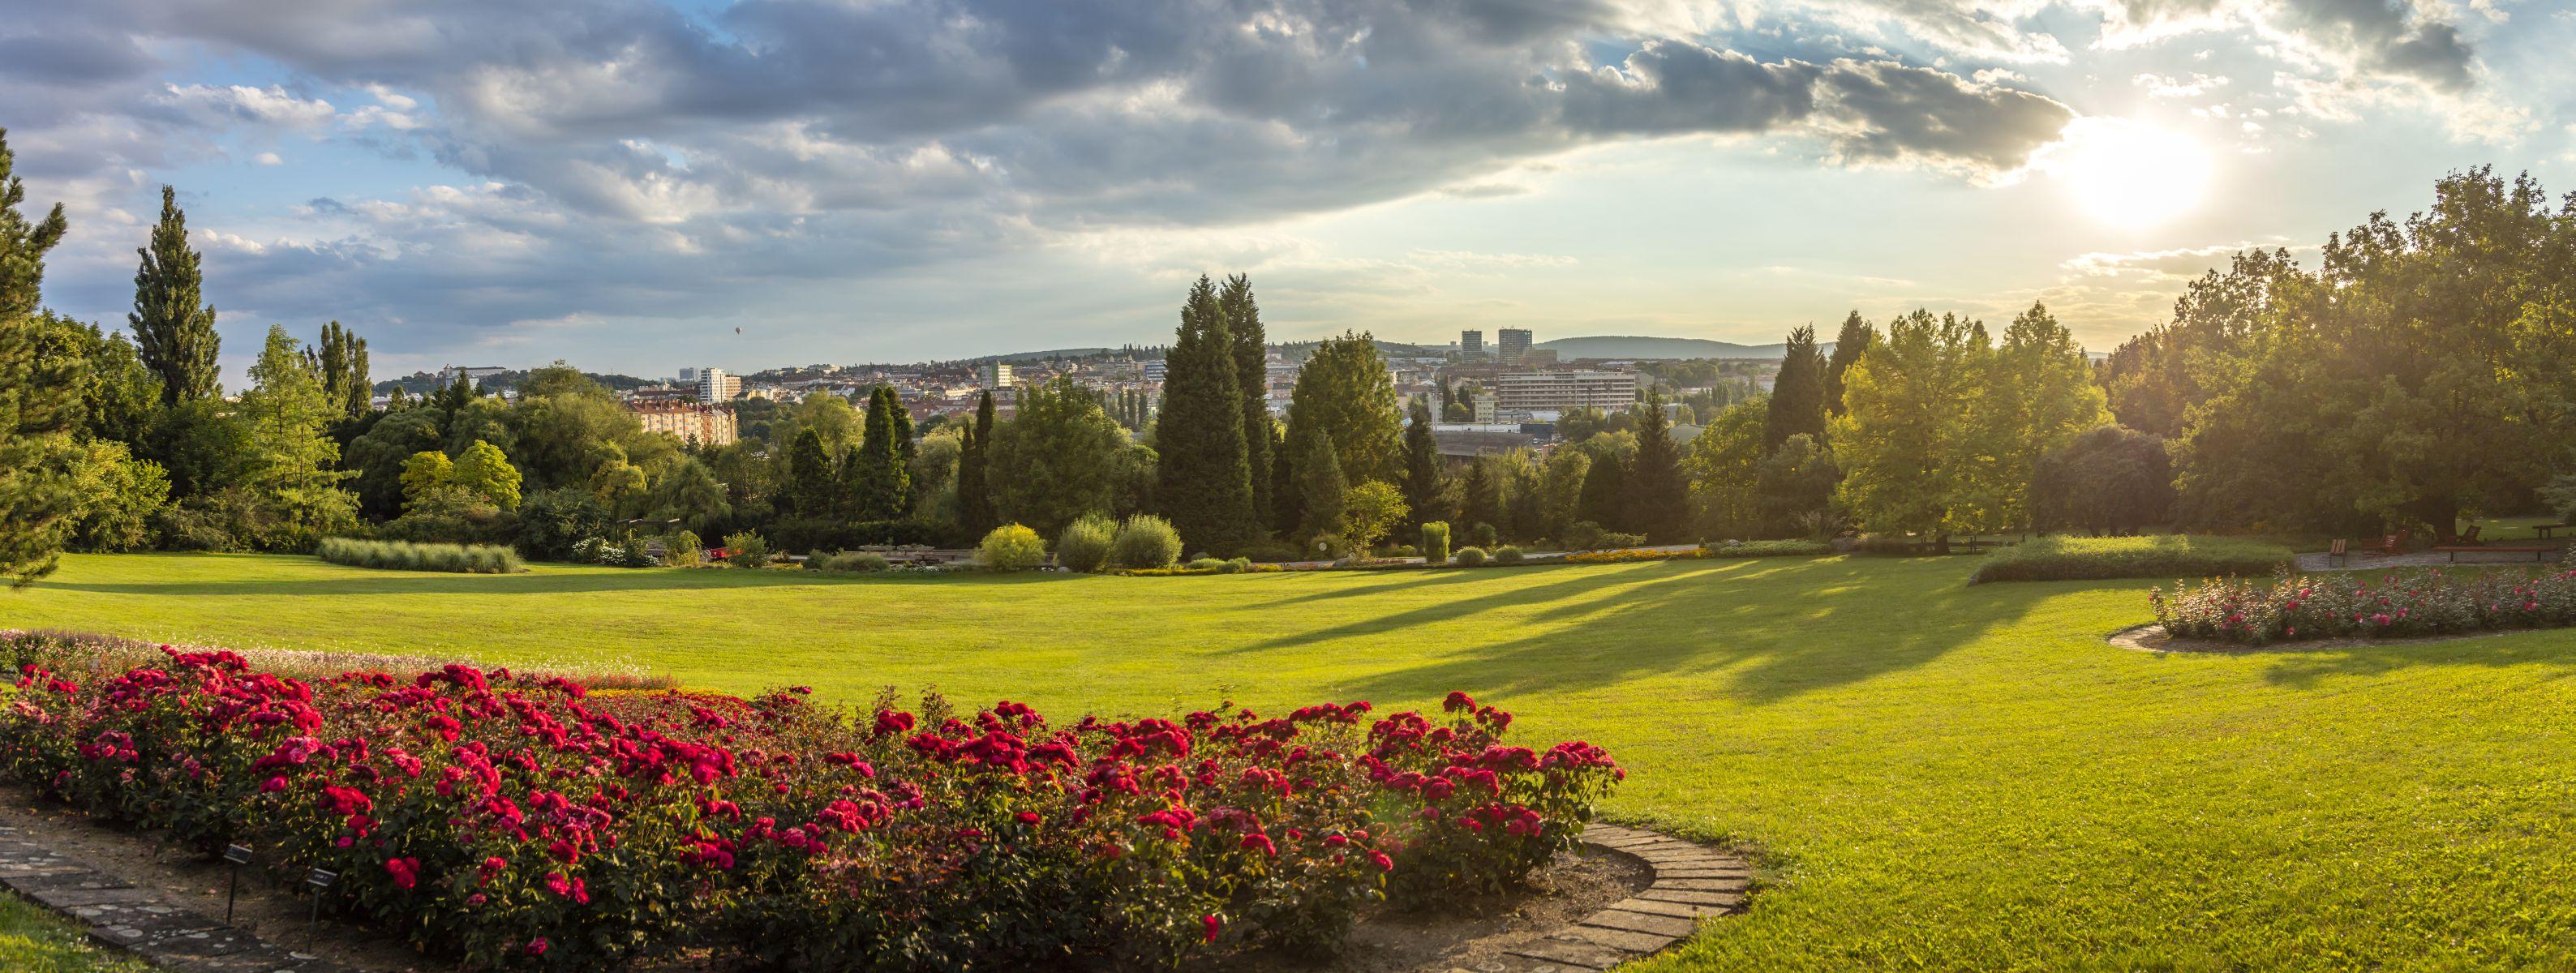 Botanical Garden and Arboretum of Mendel University